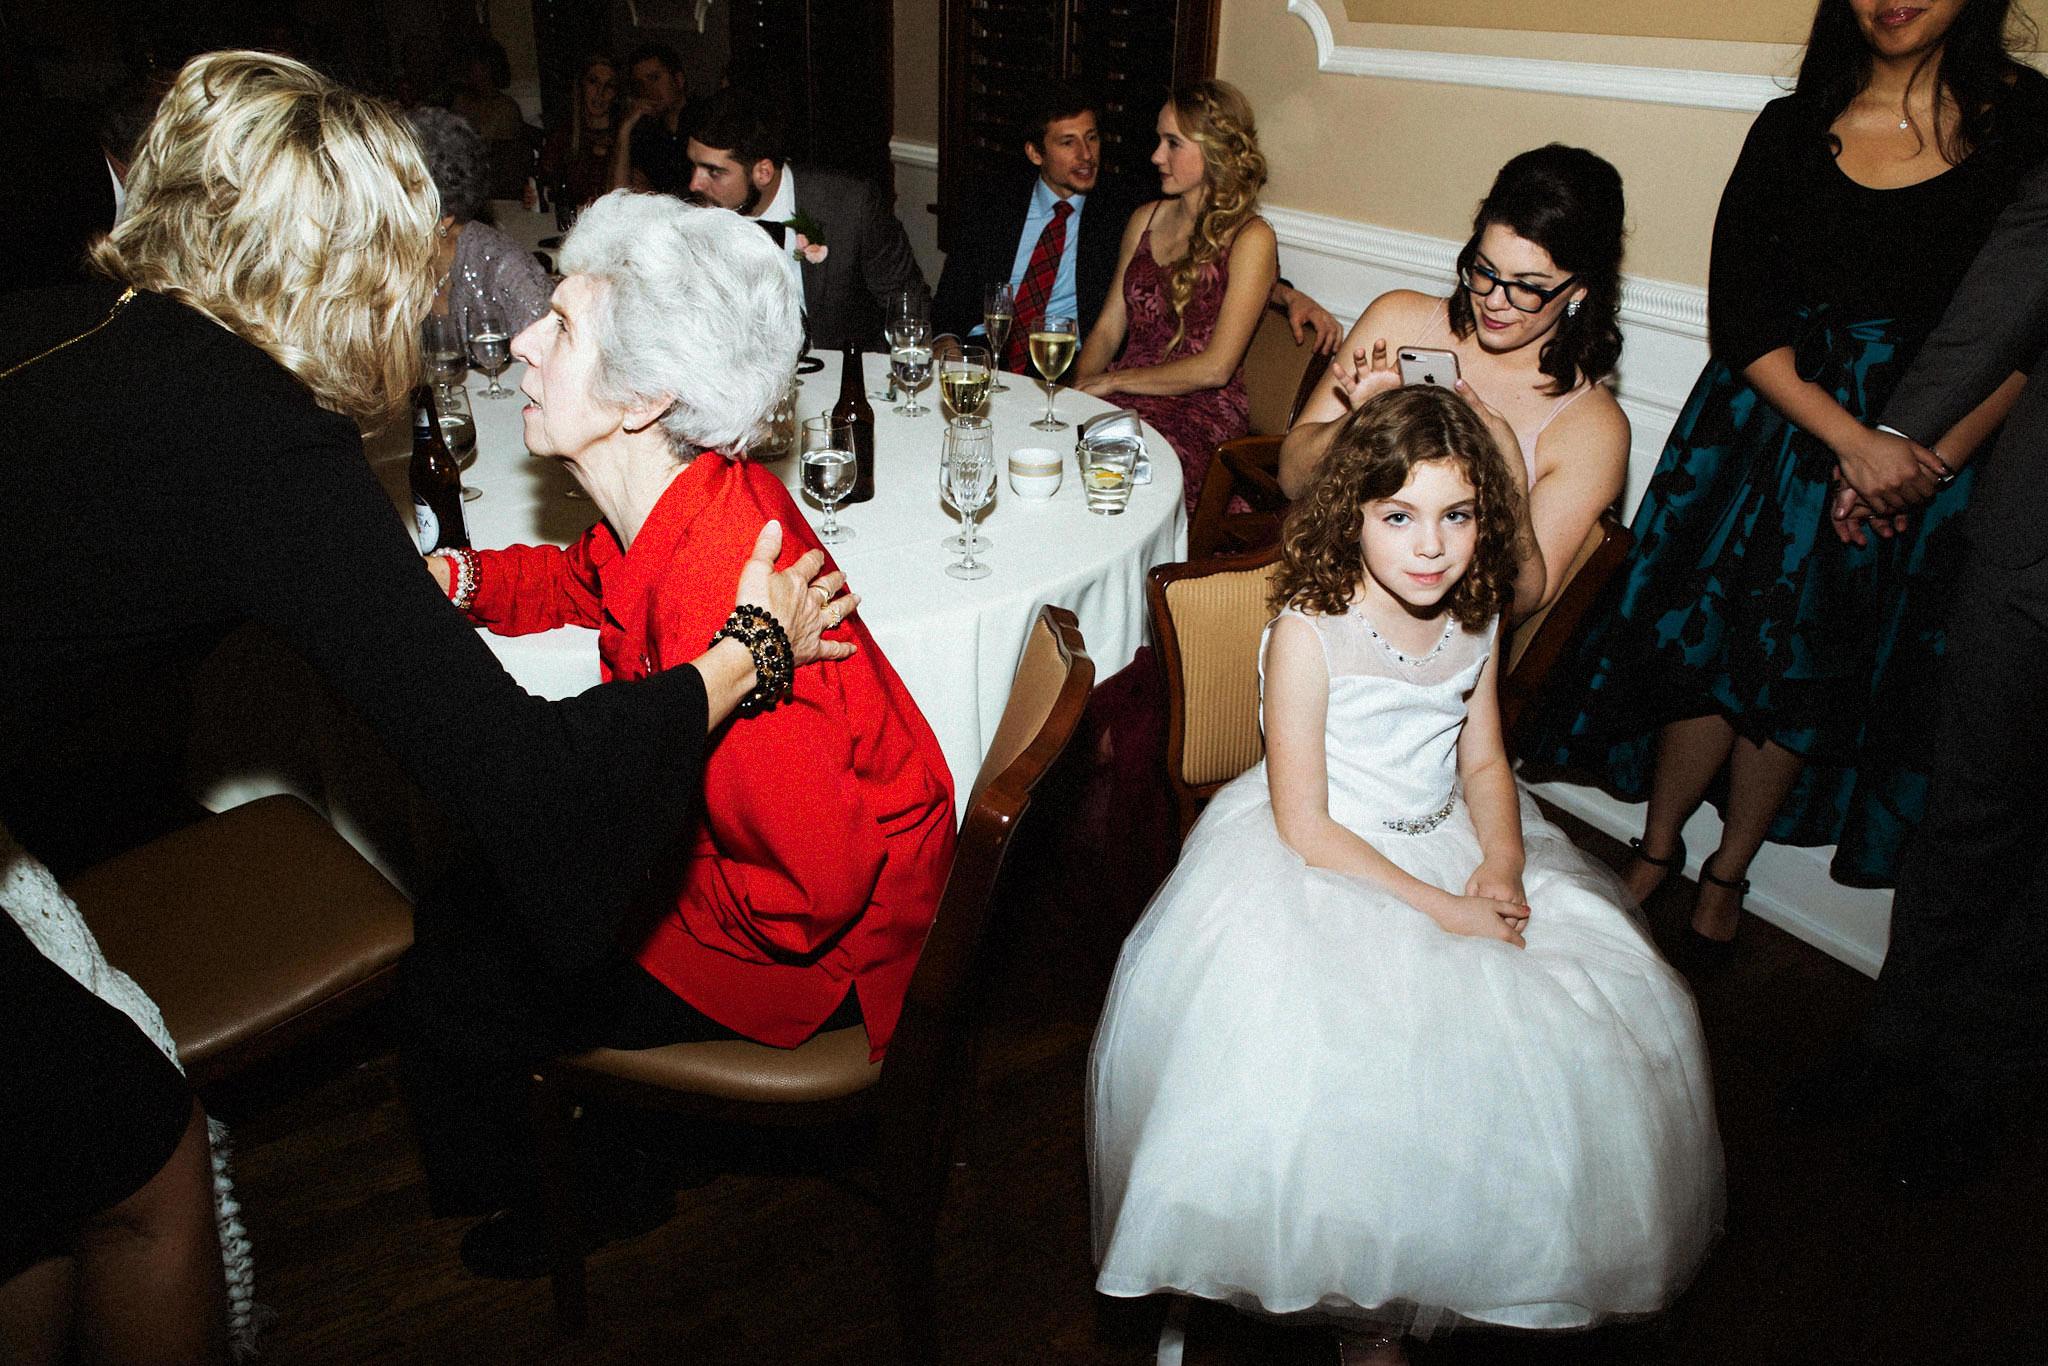 Loose Mansion Winter Wedding_Kindling Wedding Photography_03.JPG